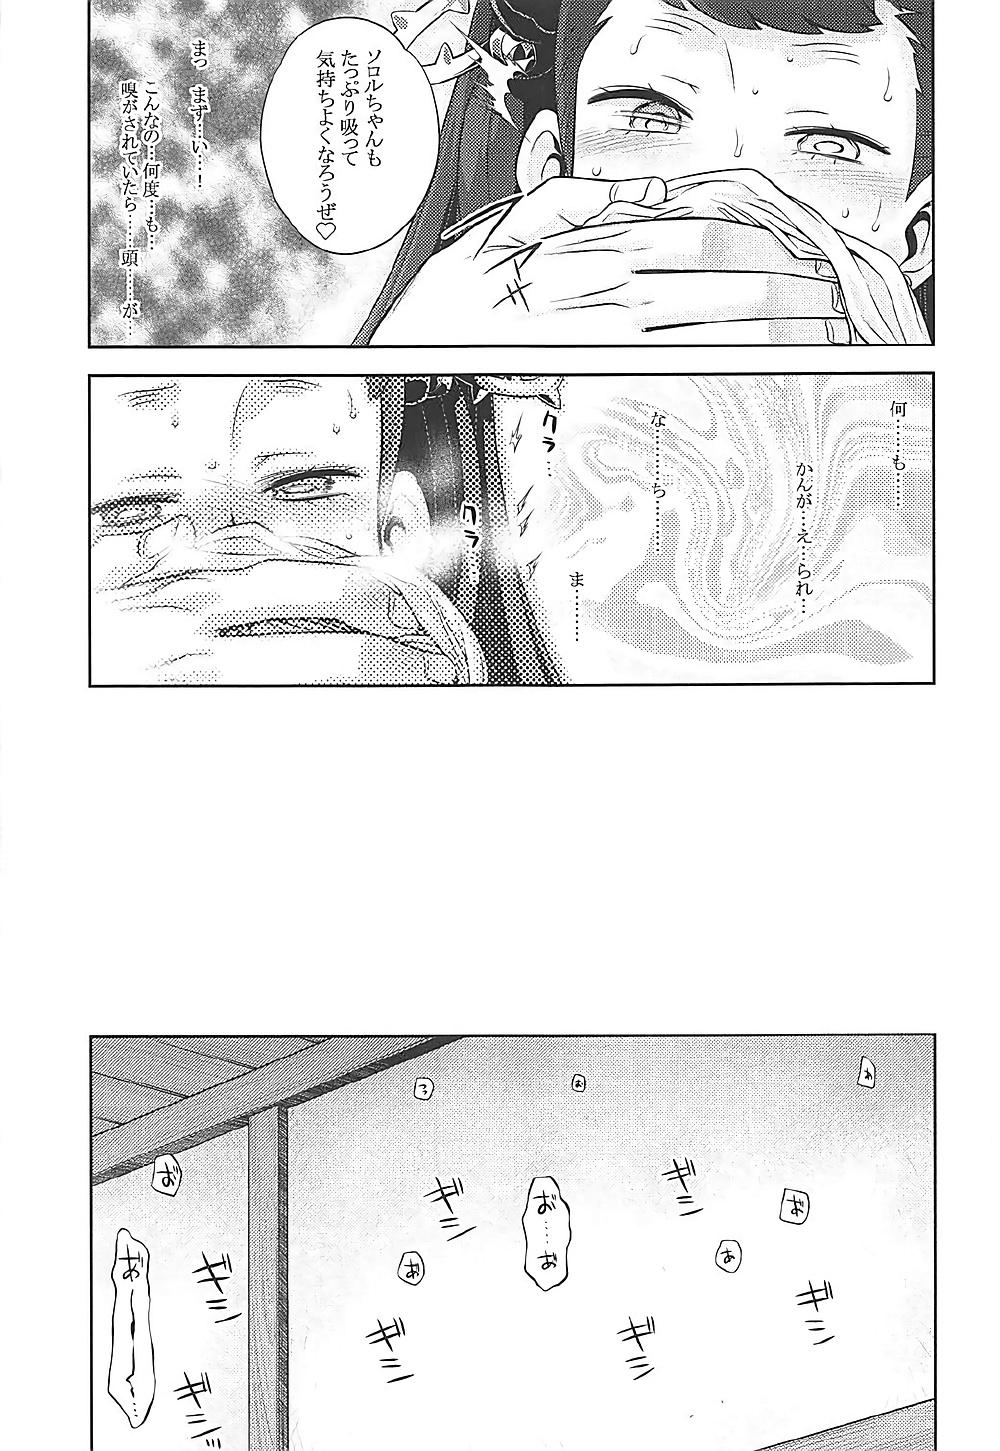 Sekaiju no Anone 29 Lilisoro Hard 17